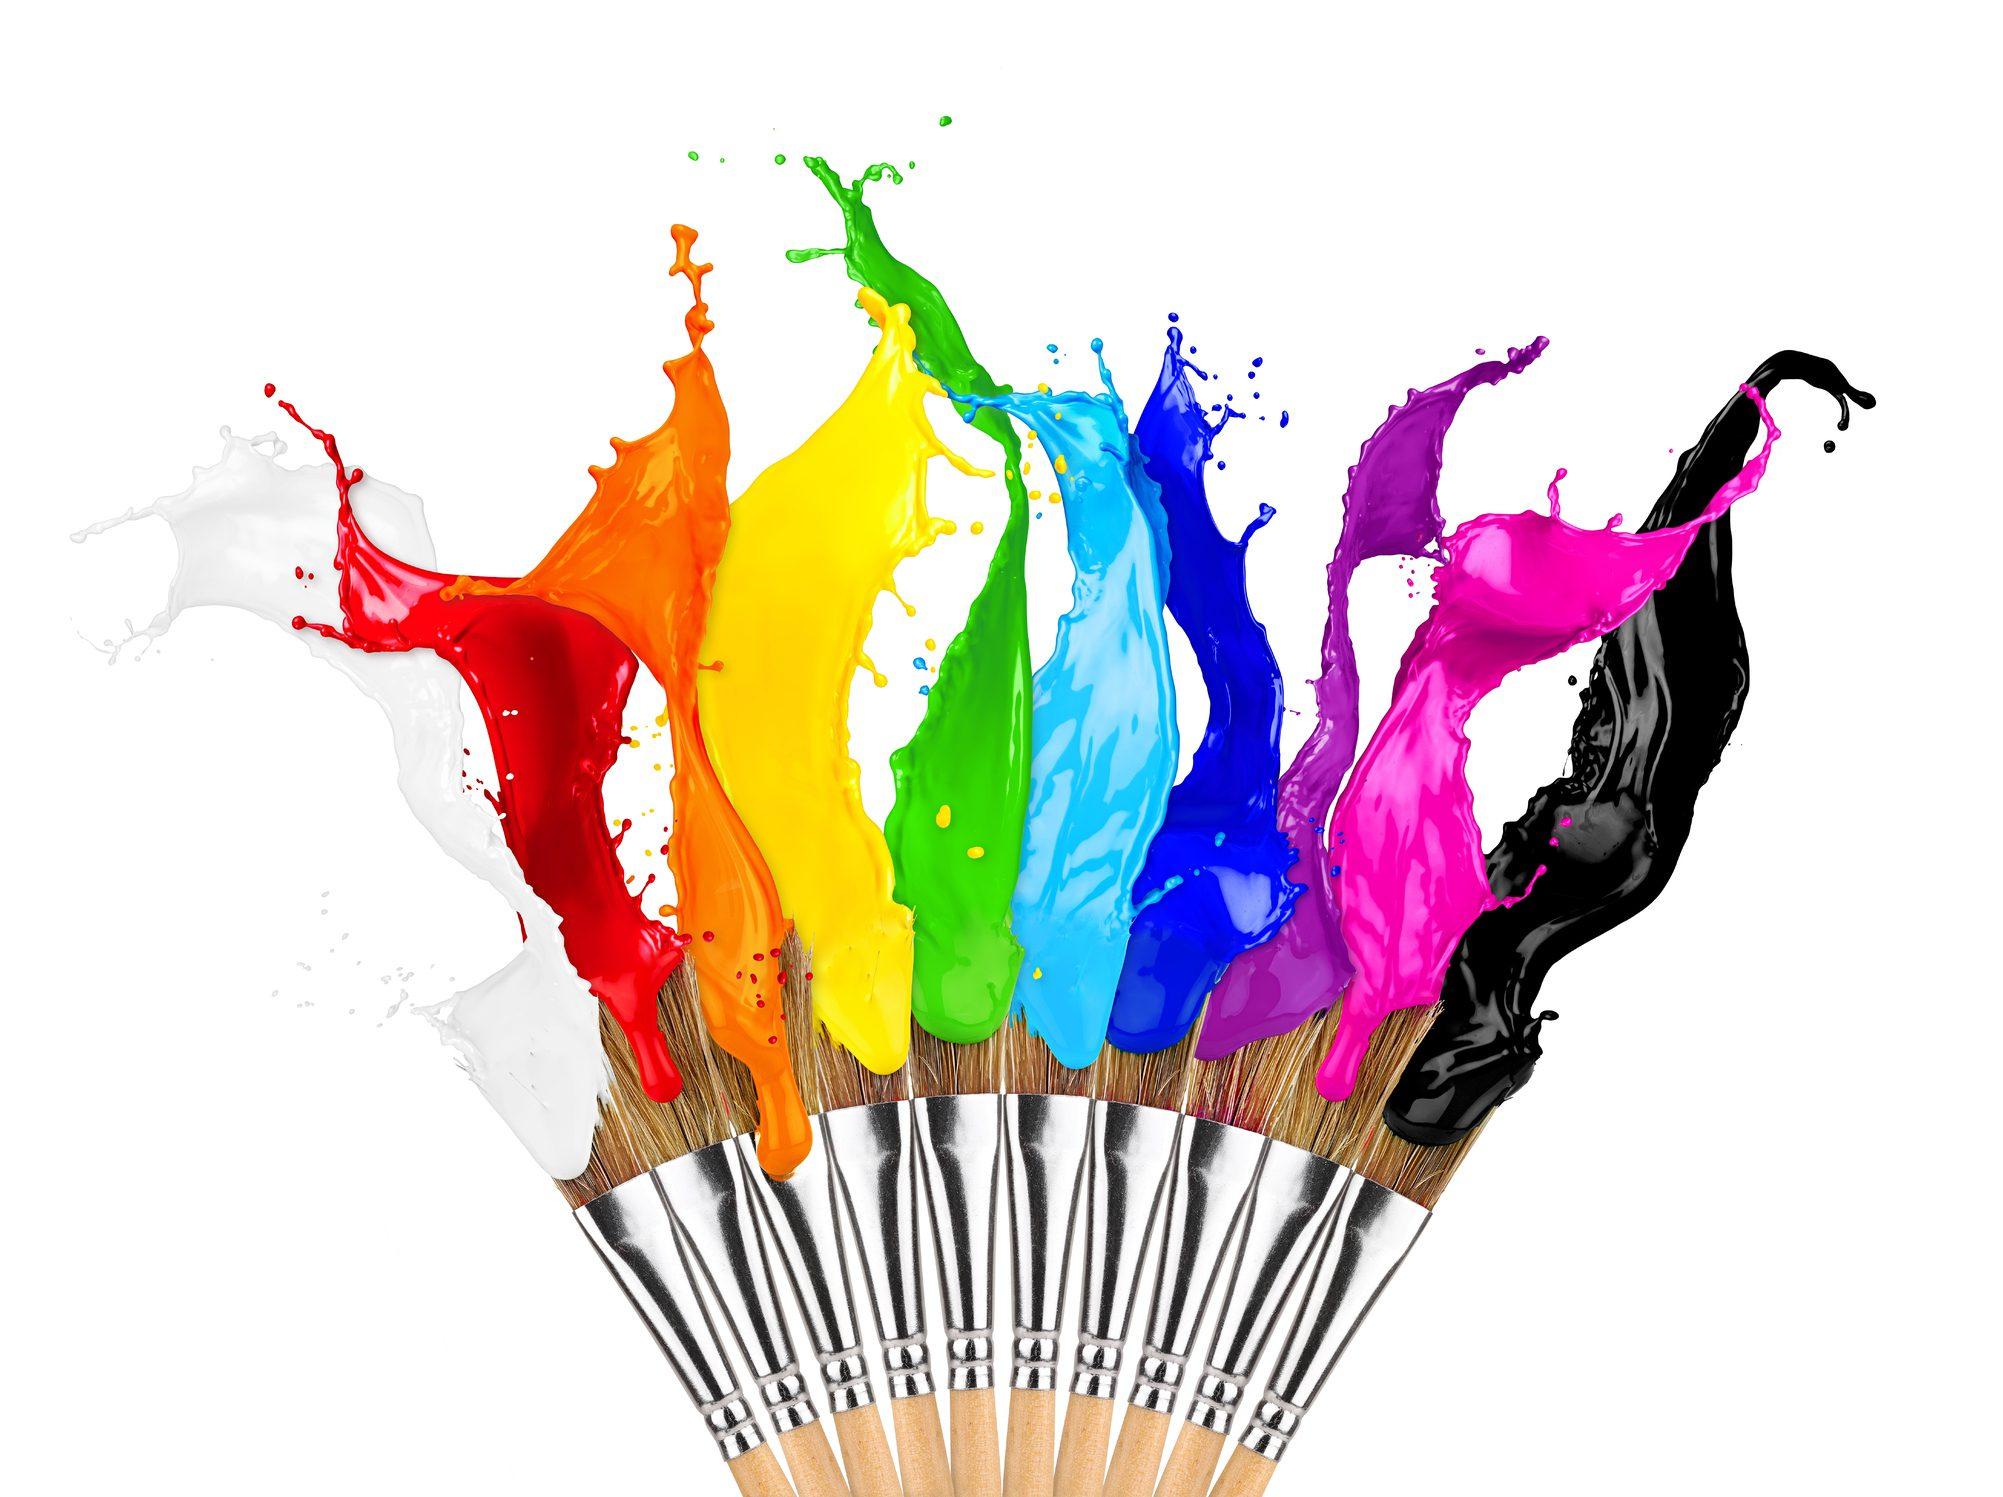 Colorful paint splatter on brushes